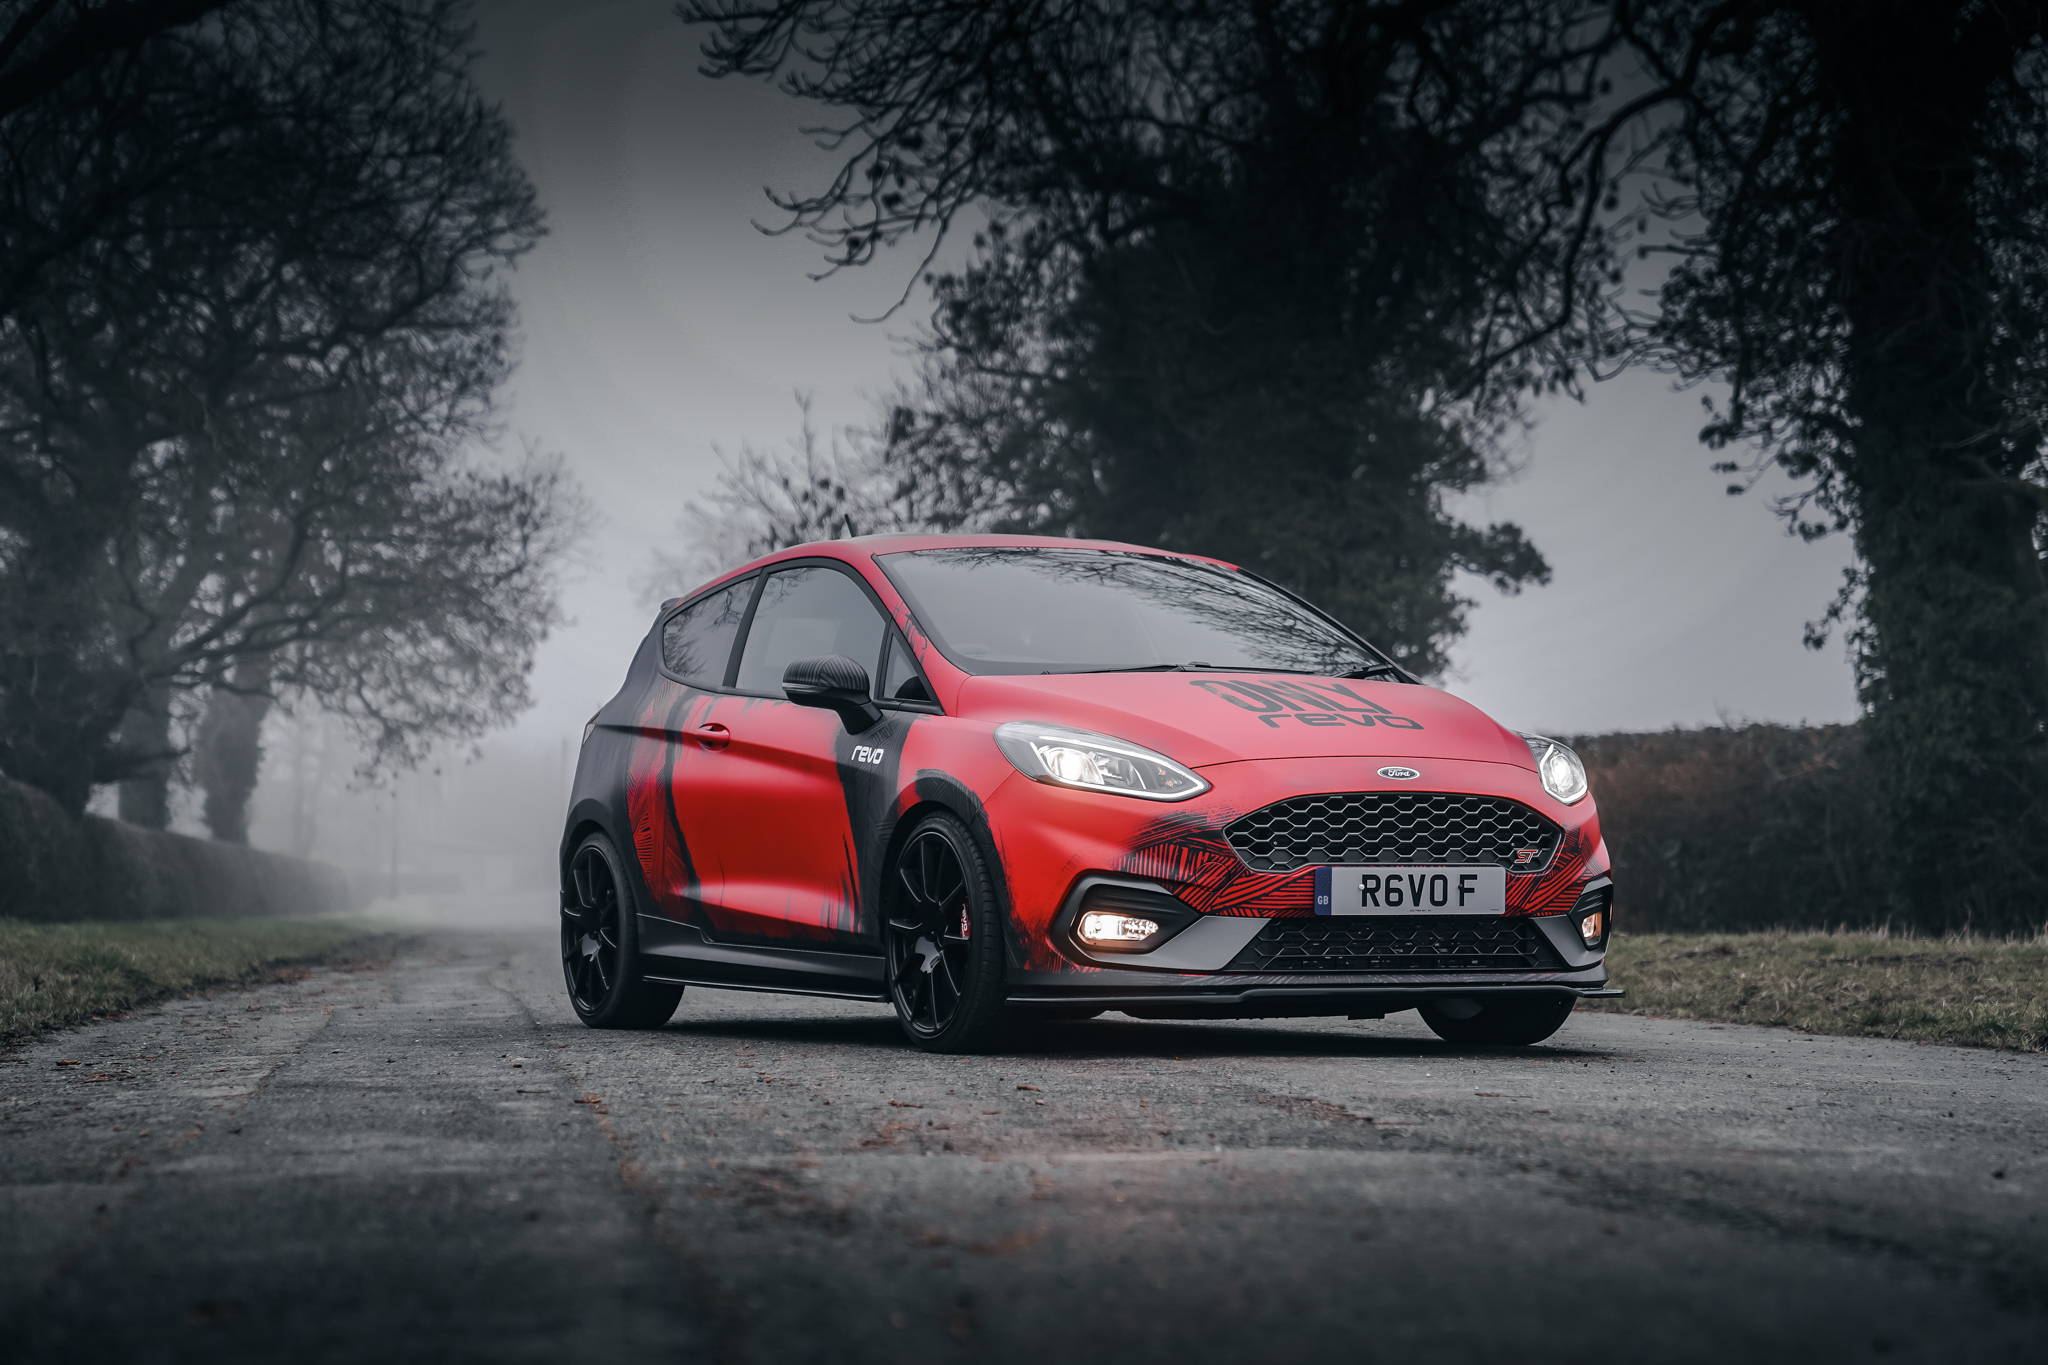 Ford Performance Revo Remaps in Carlisle, Cumbria